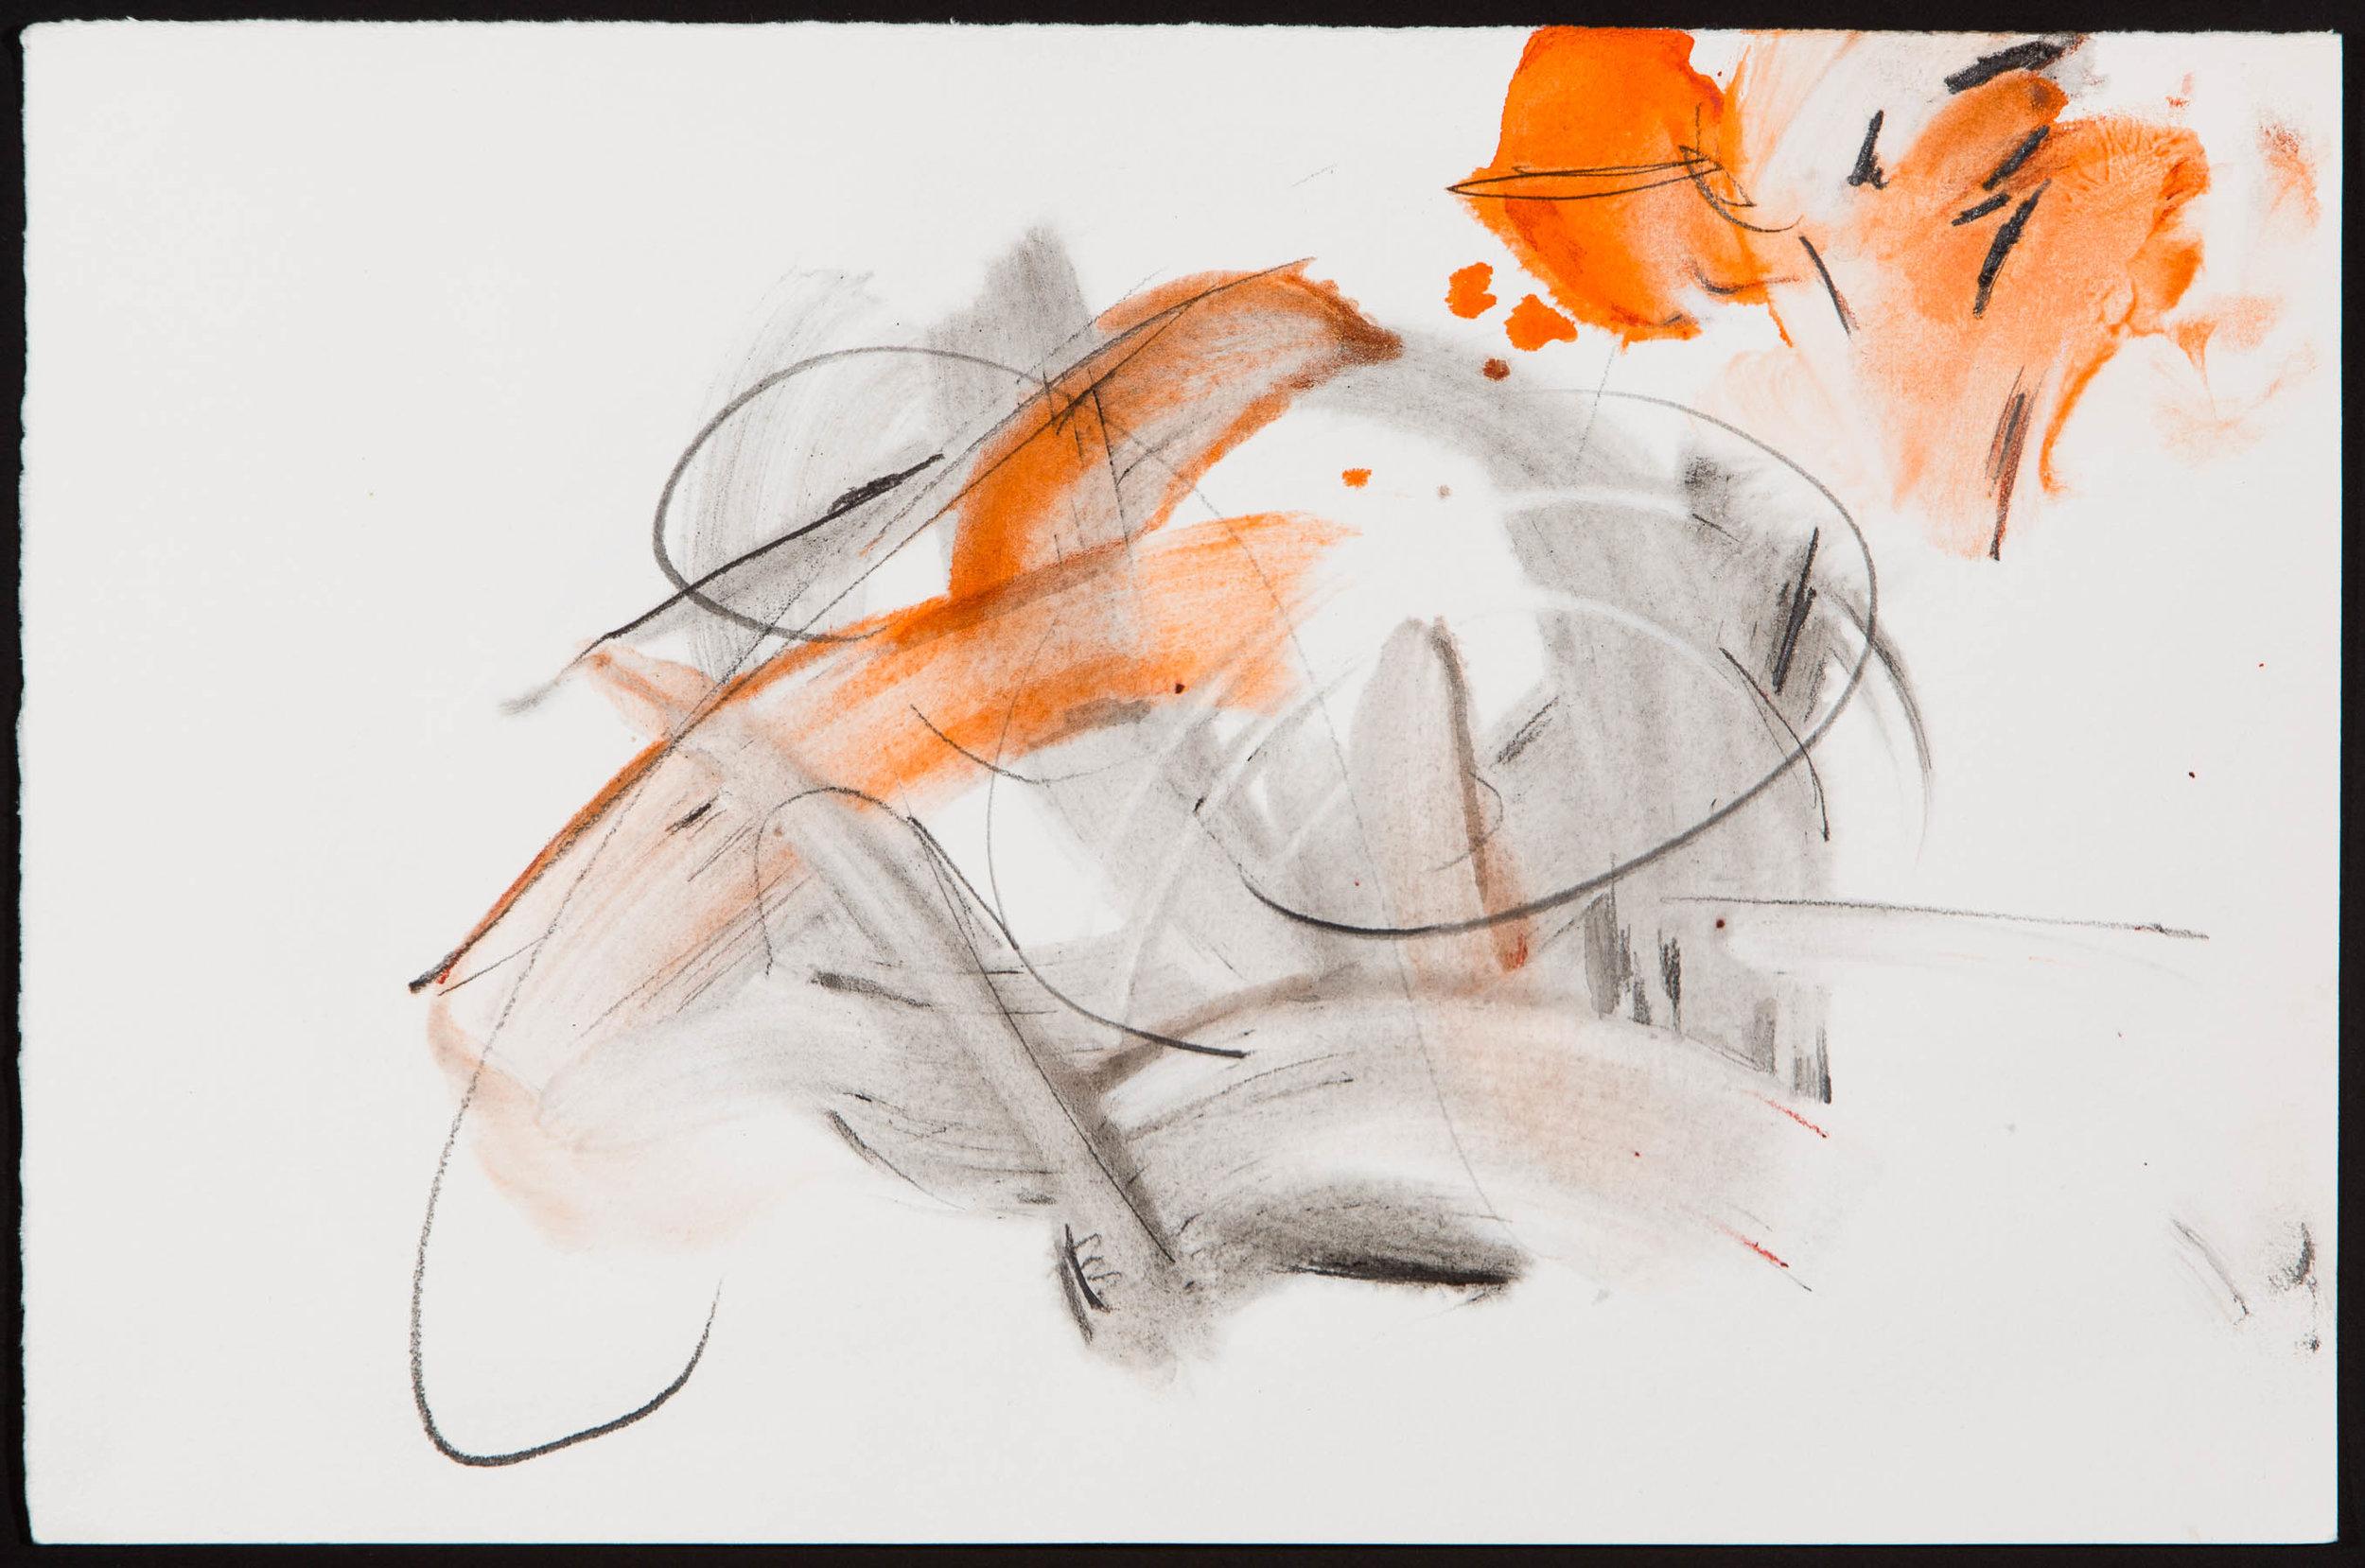 Composition in Music, Orange (2016)